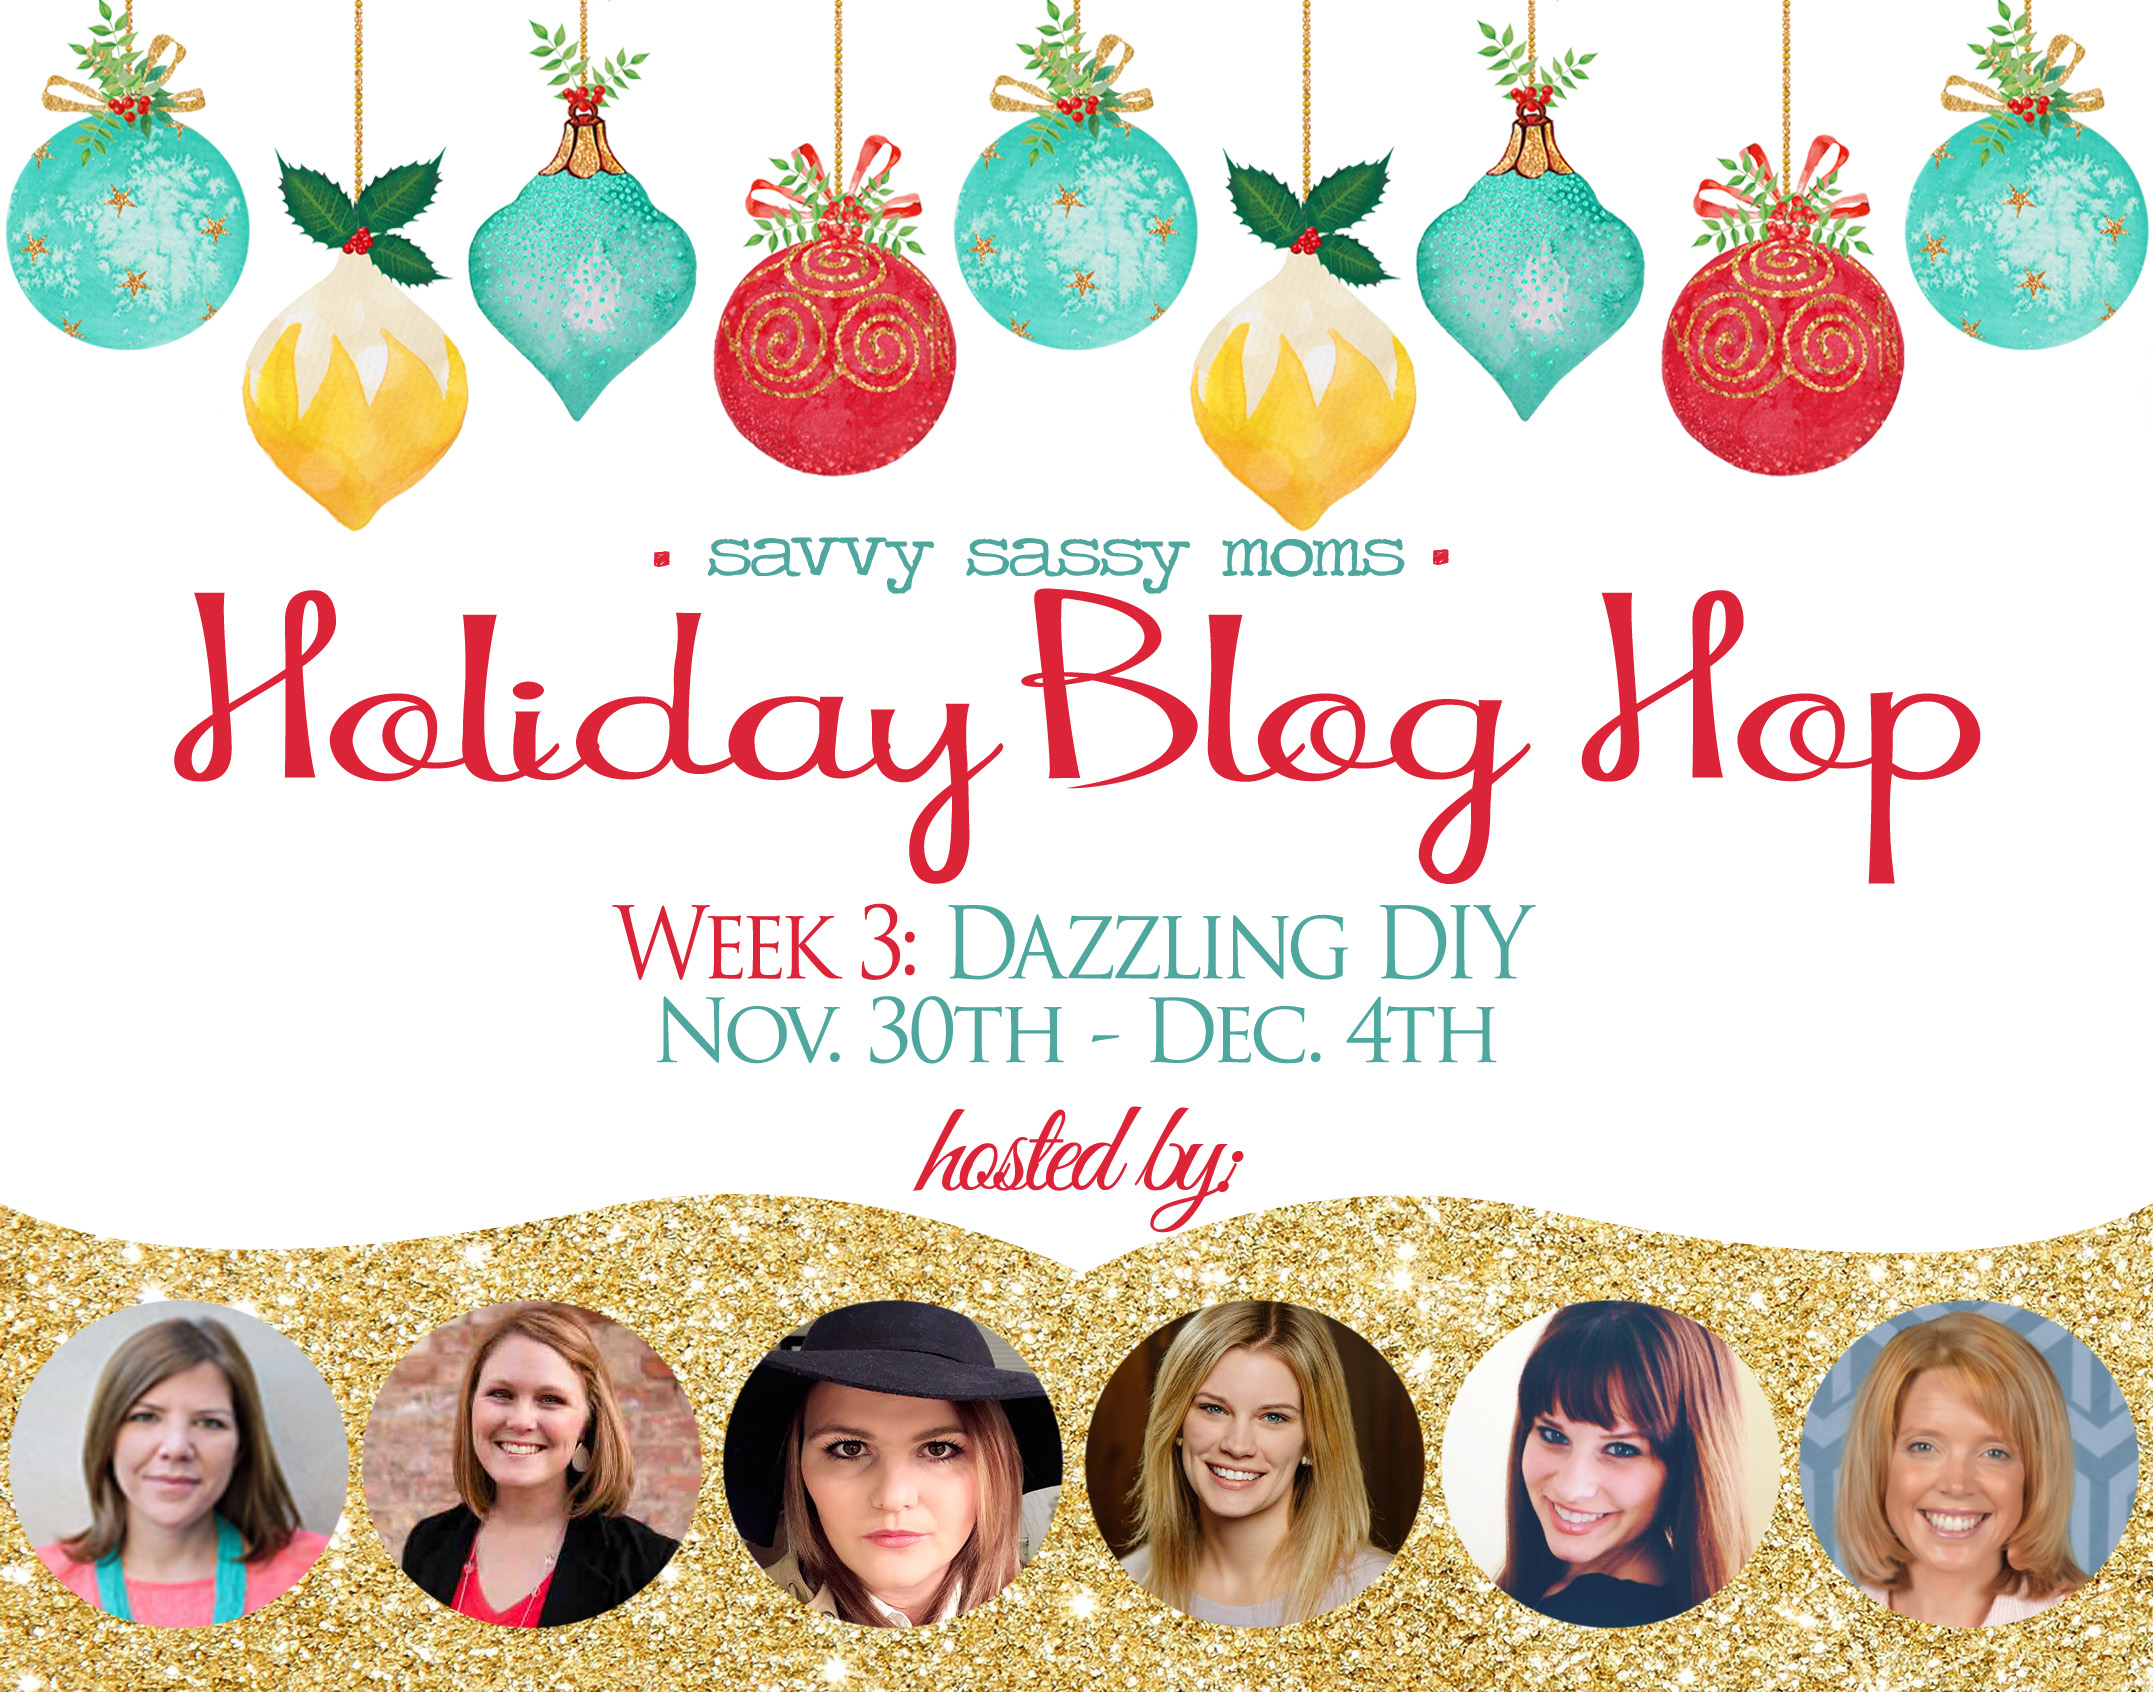 Holiday Blog Hop: Dazzling Holiday DIY Ideas